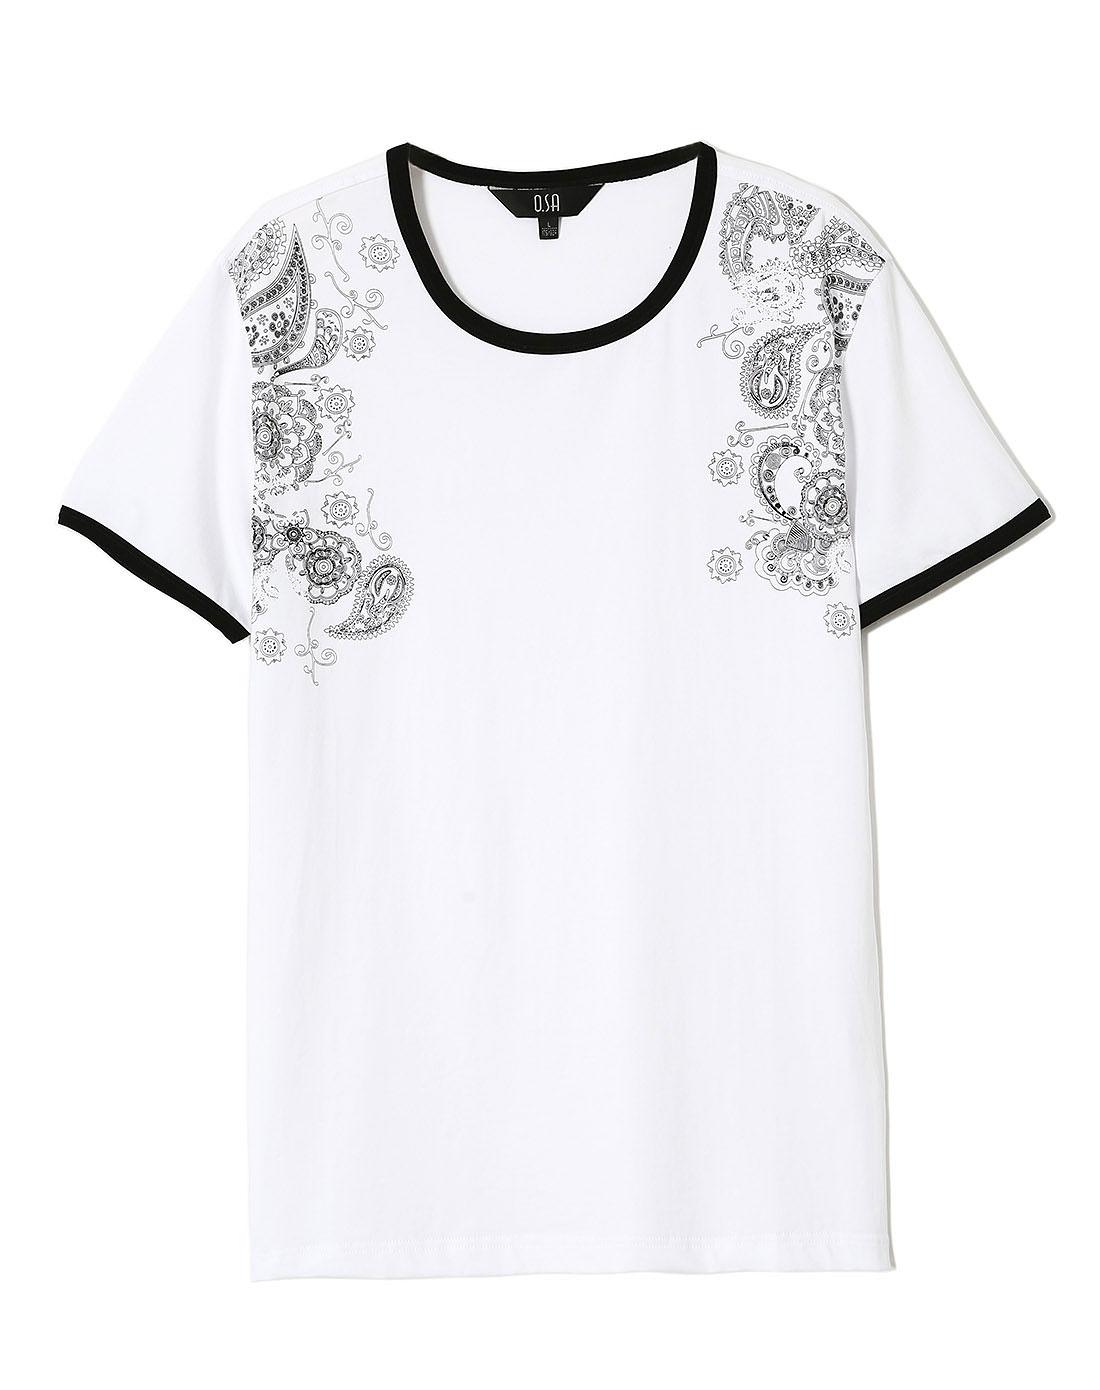 osa白色设计感图案短袖t恤